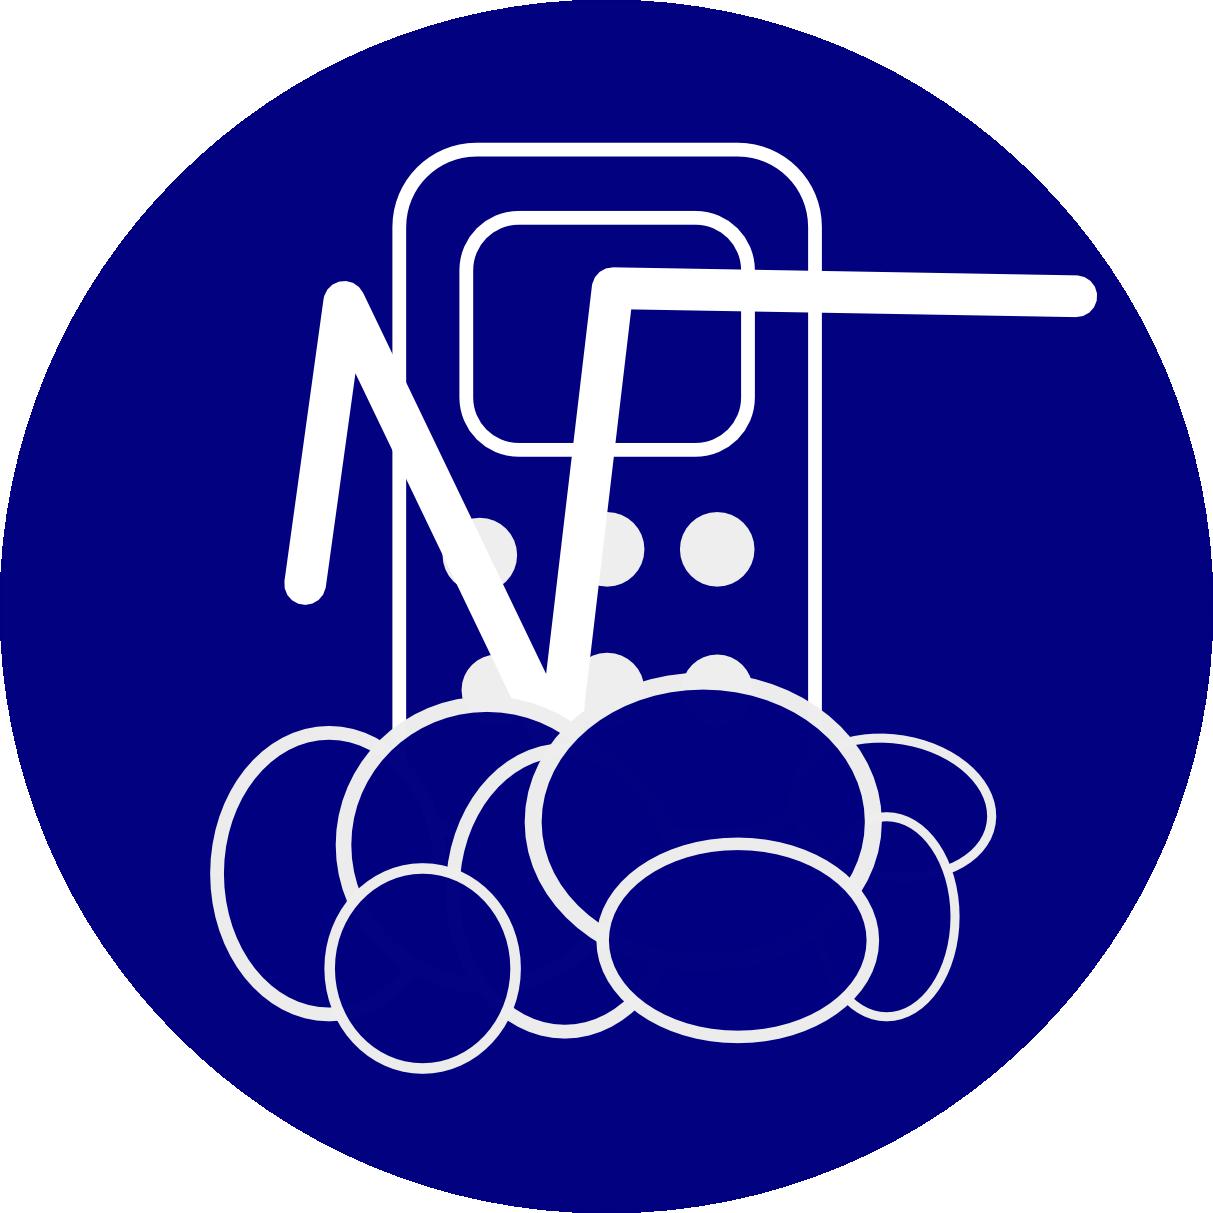 Noalyss